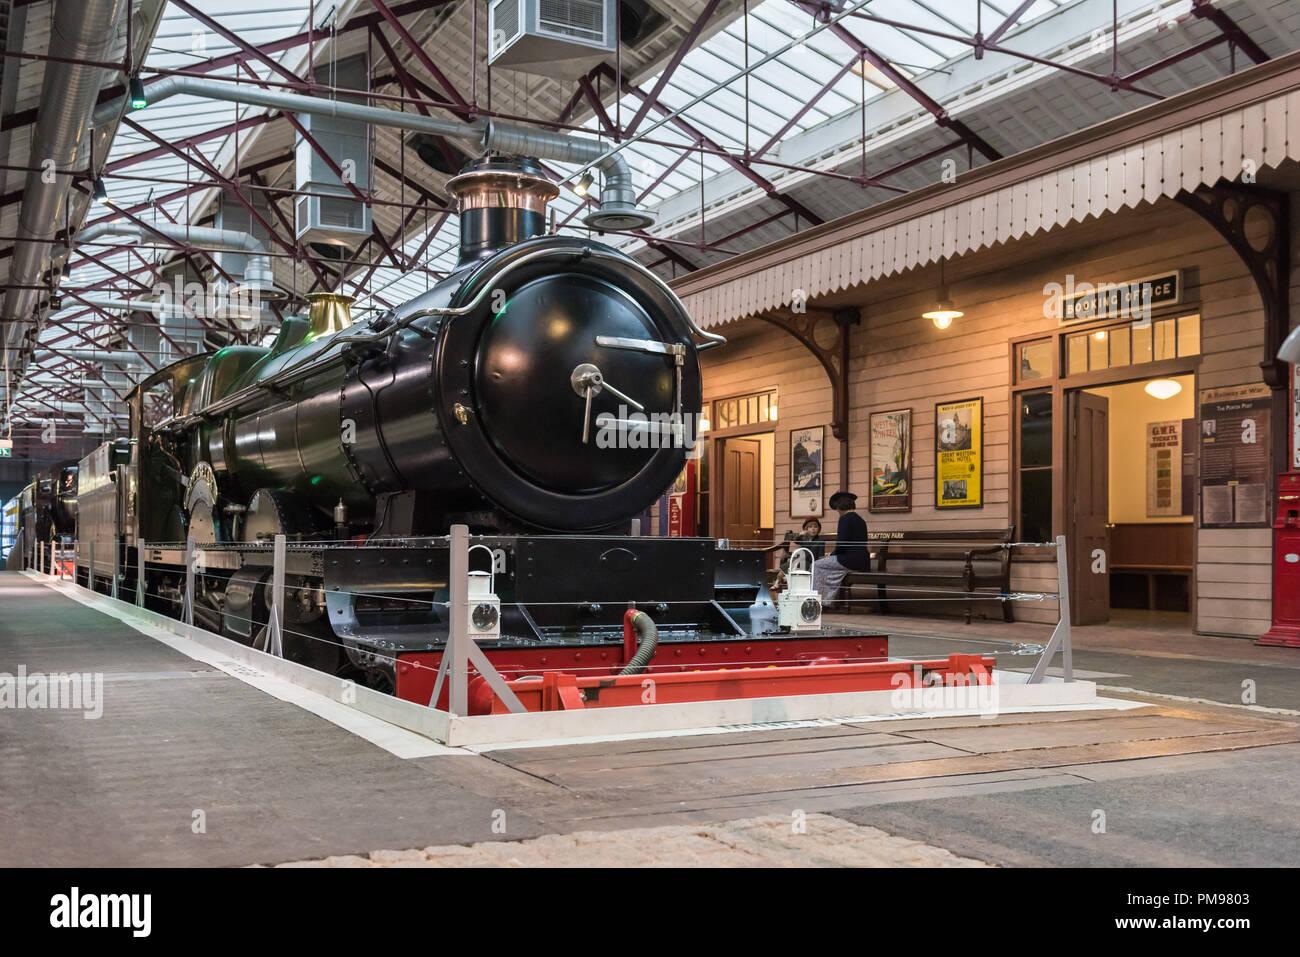 4003 Lode Star GWR locomotive, STEAM, Great Western Railway Museum, Swindon, UK - Stock Image